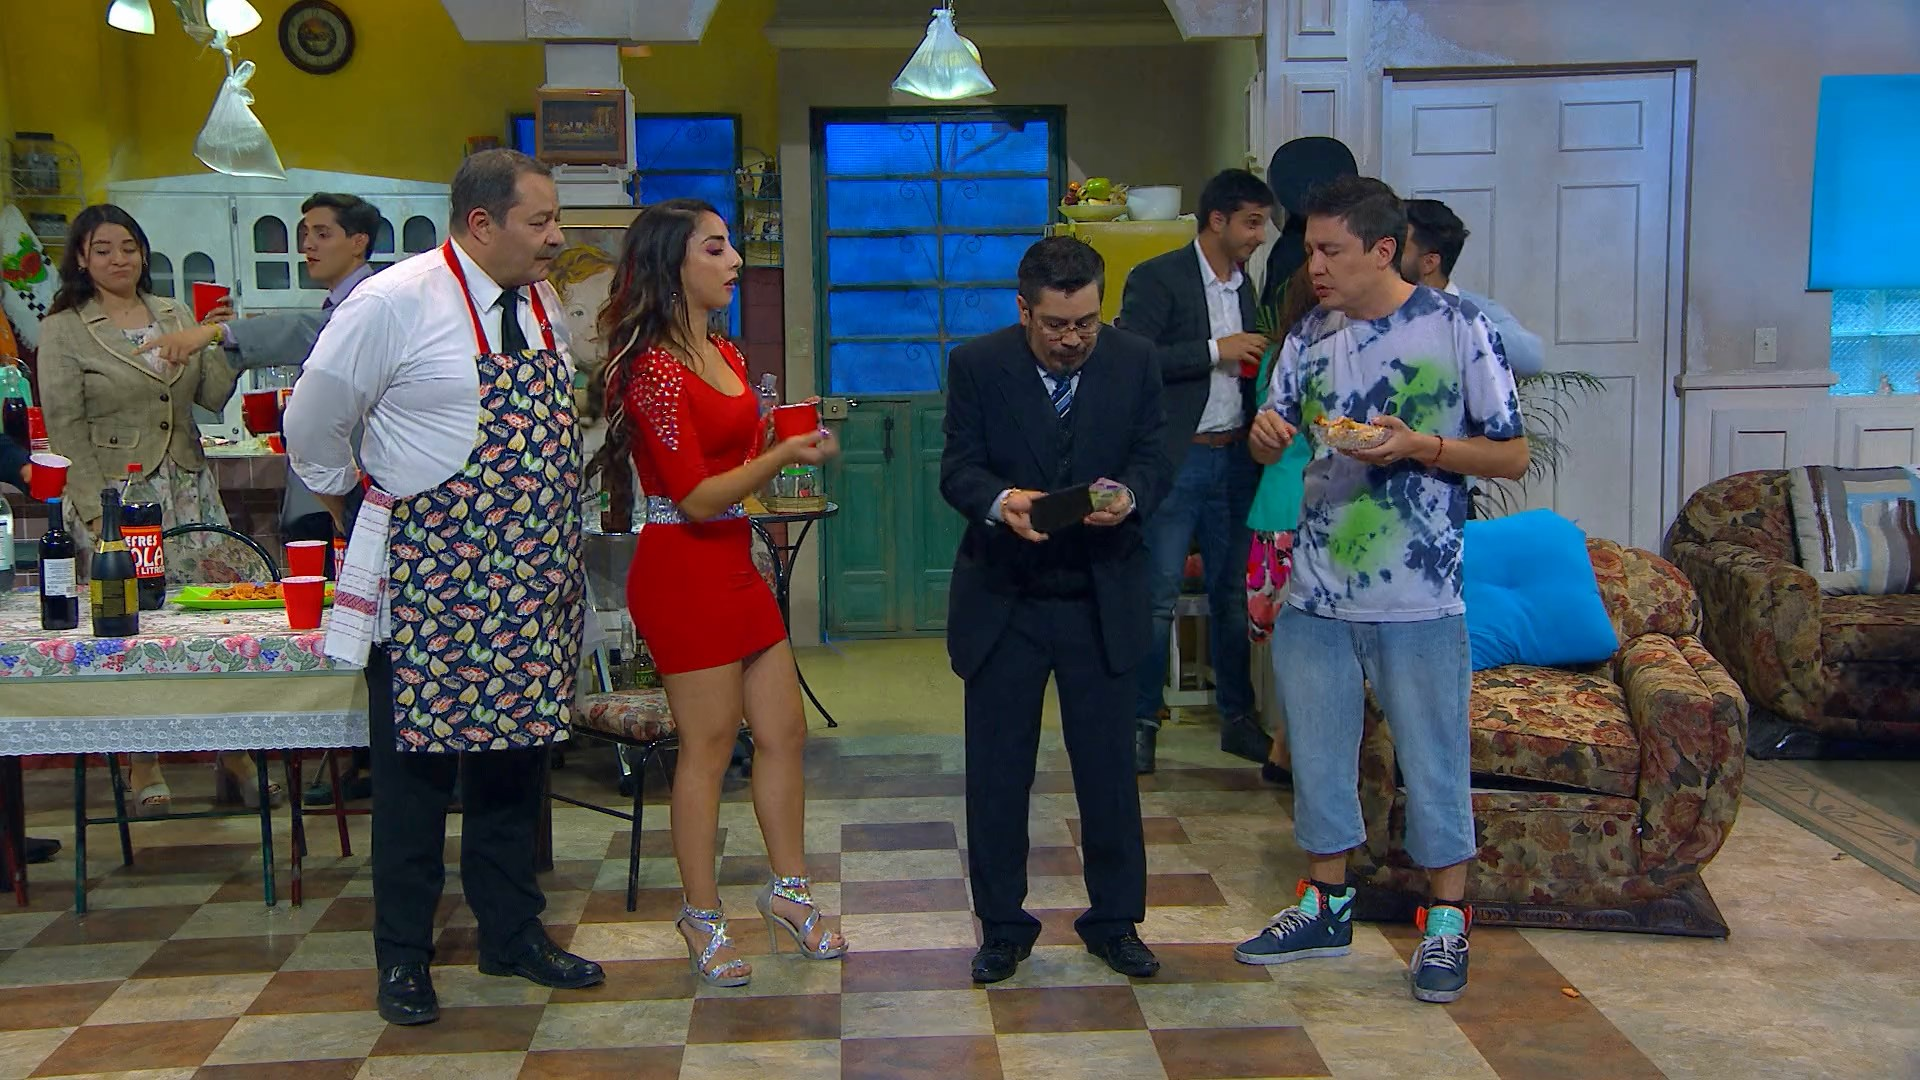 Se Rentan Cuartos Temporada 2 (2020) 1080p WEB-DL Latino